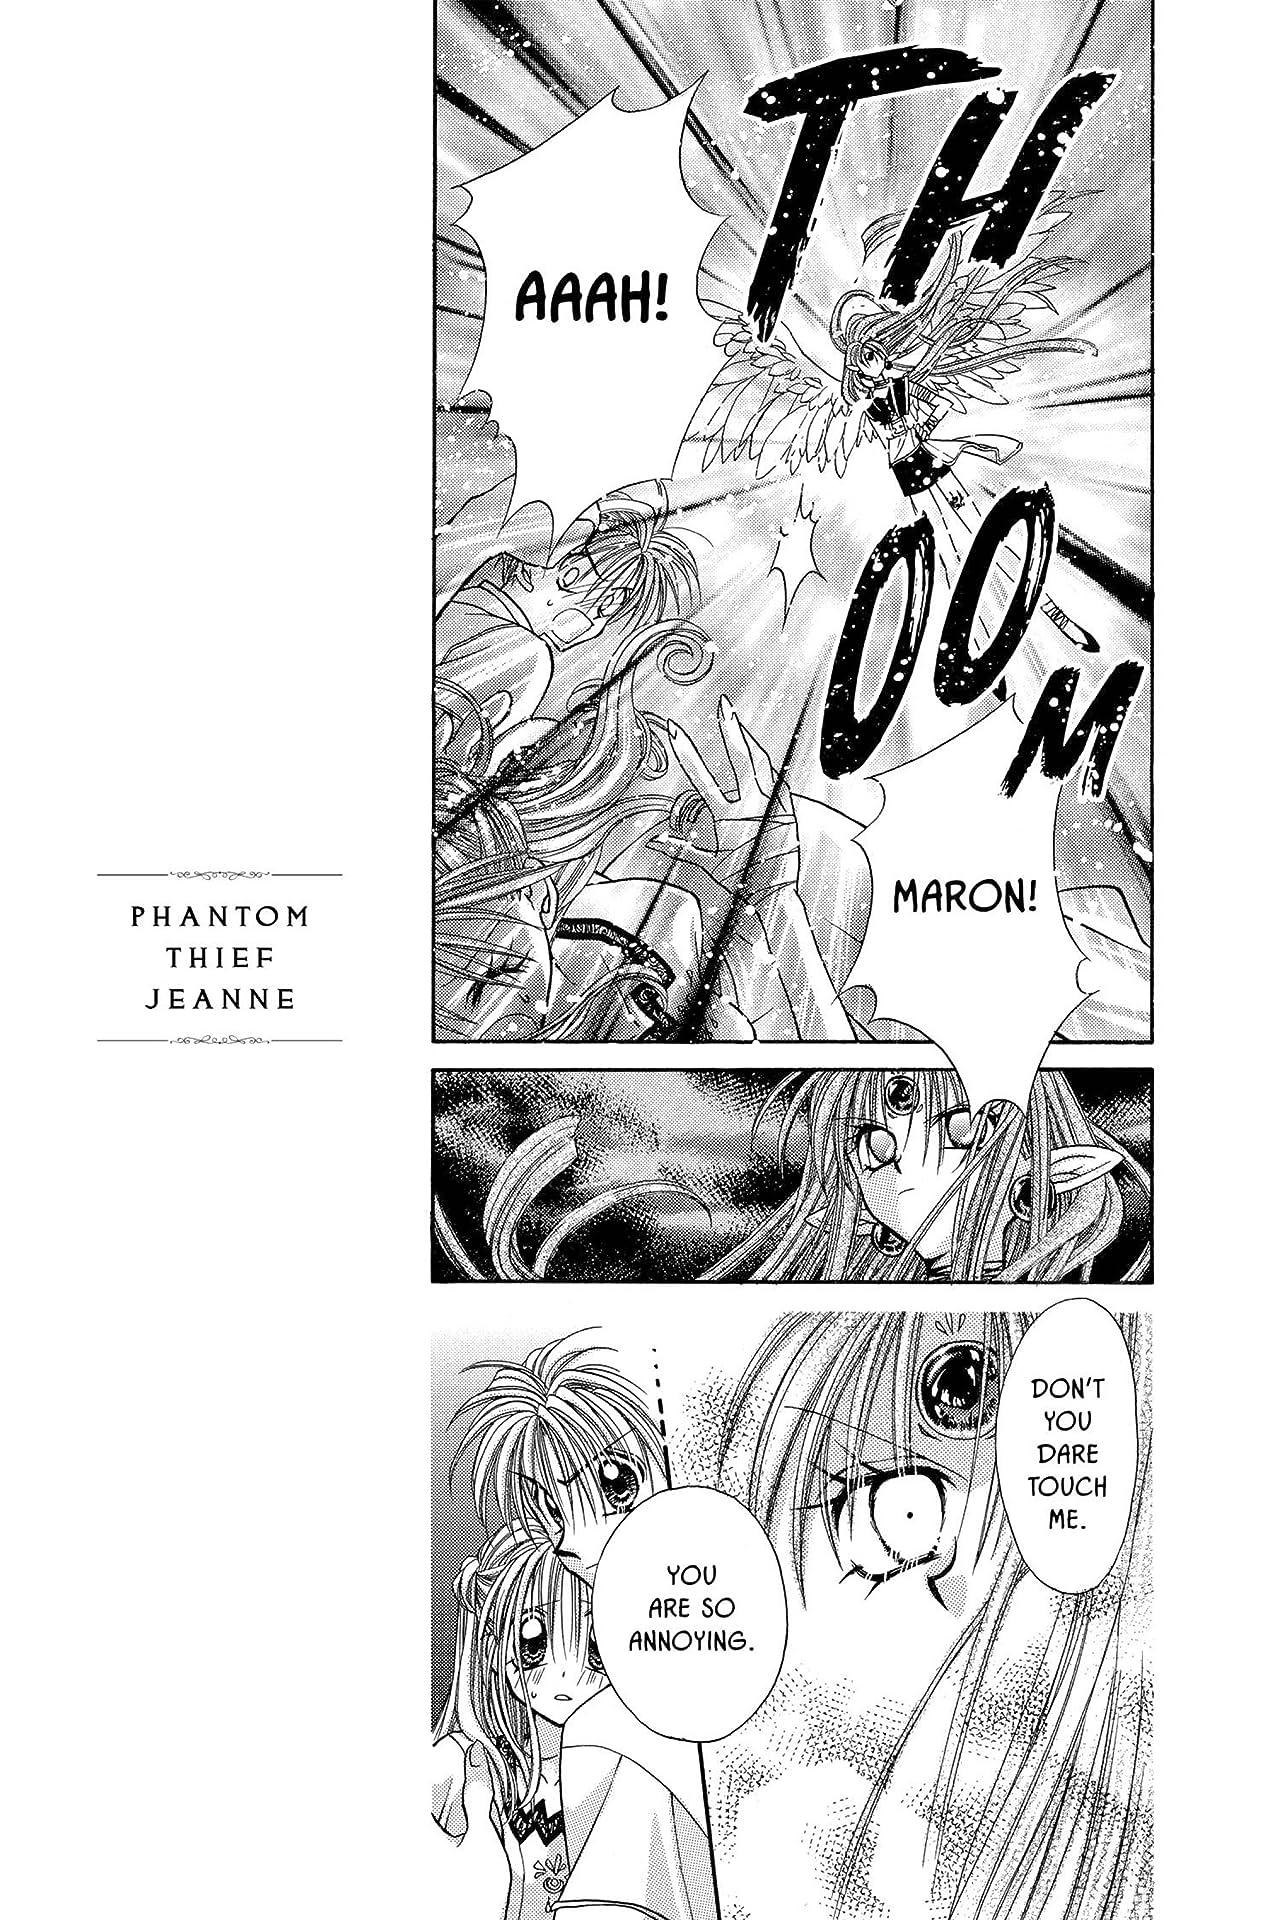 Phantom Thief Jeanne Vol. 4